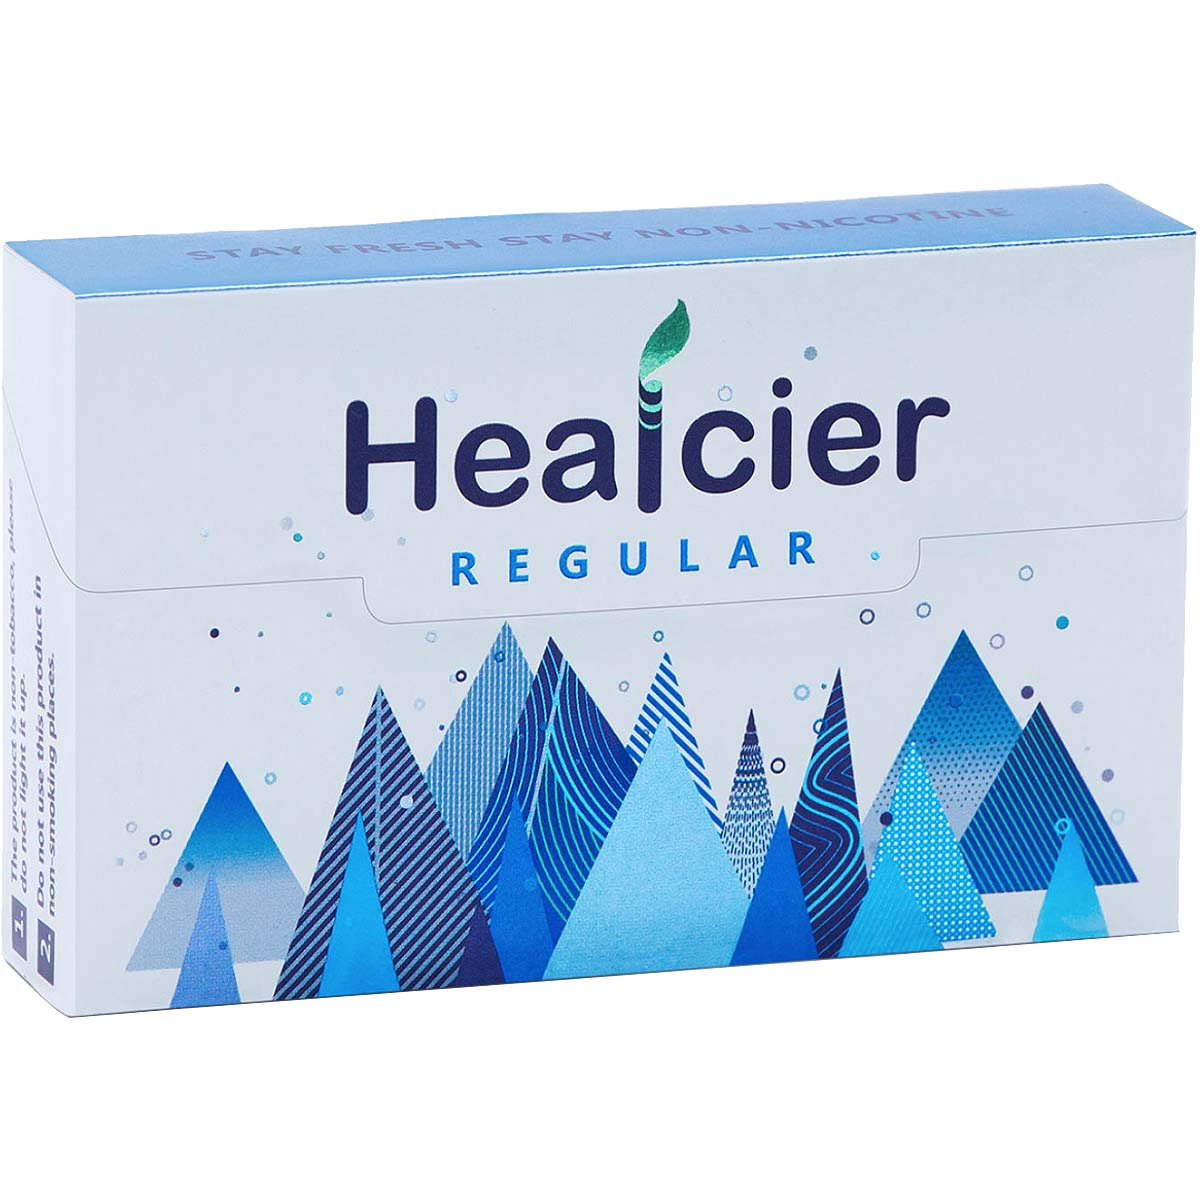 Healcier - Regular (No Nicotine)